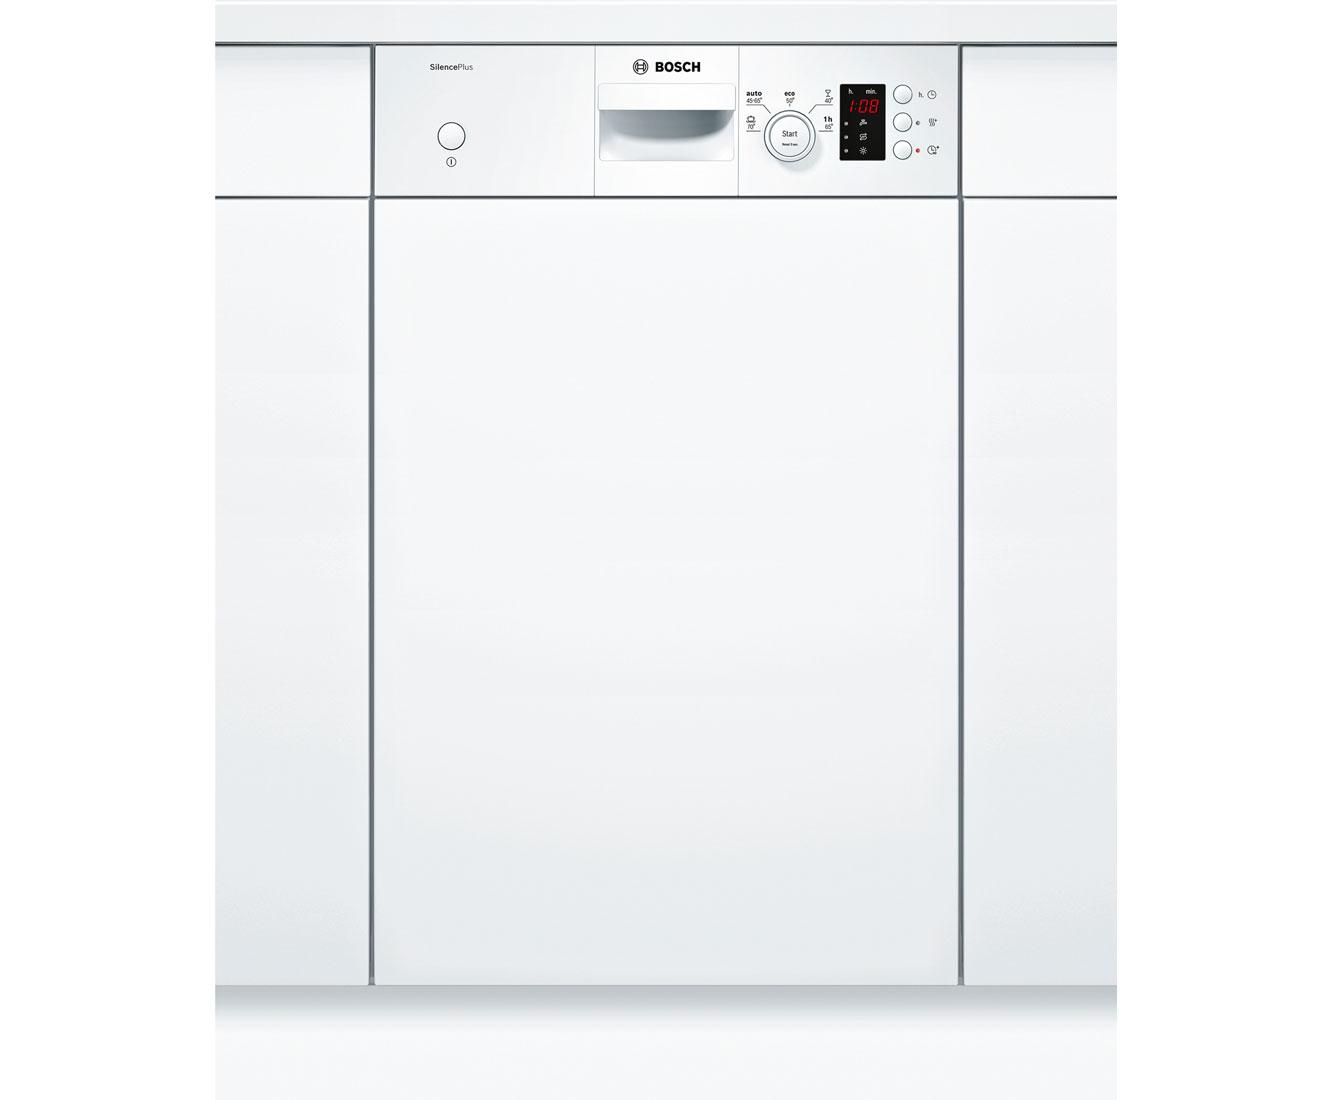 Bosch SPI25CW03E Geschirrspüler 45 cm - Weiss | Küche und Esszimmer > Küchenelektrogeräte | Weiss | Bosch